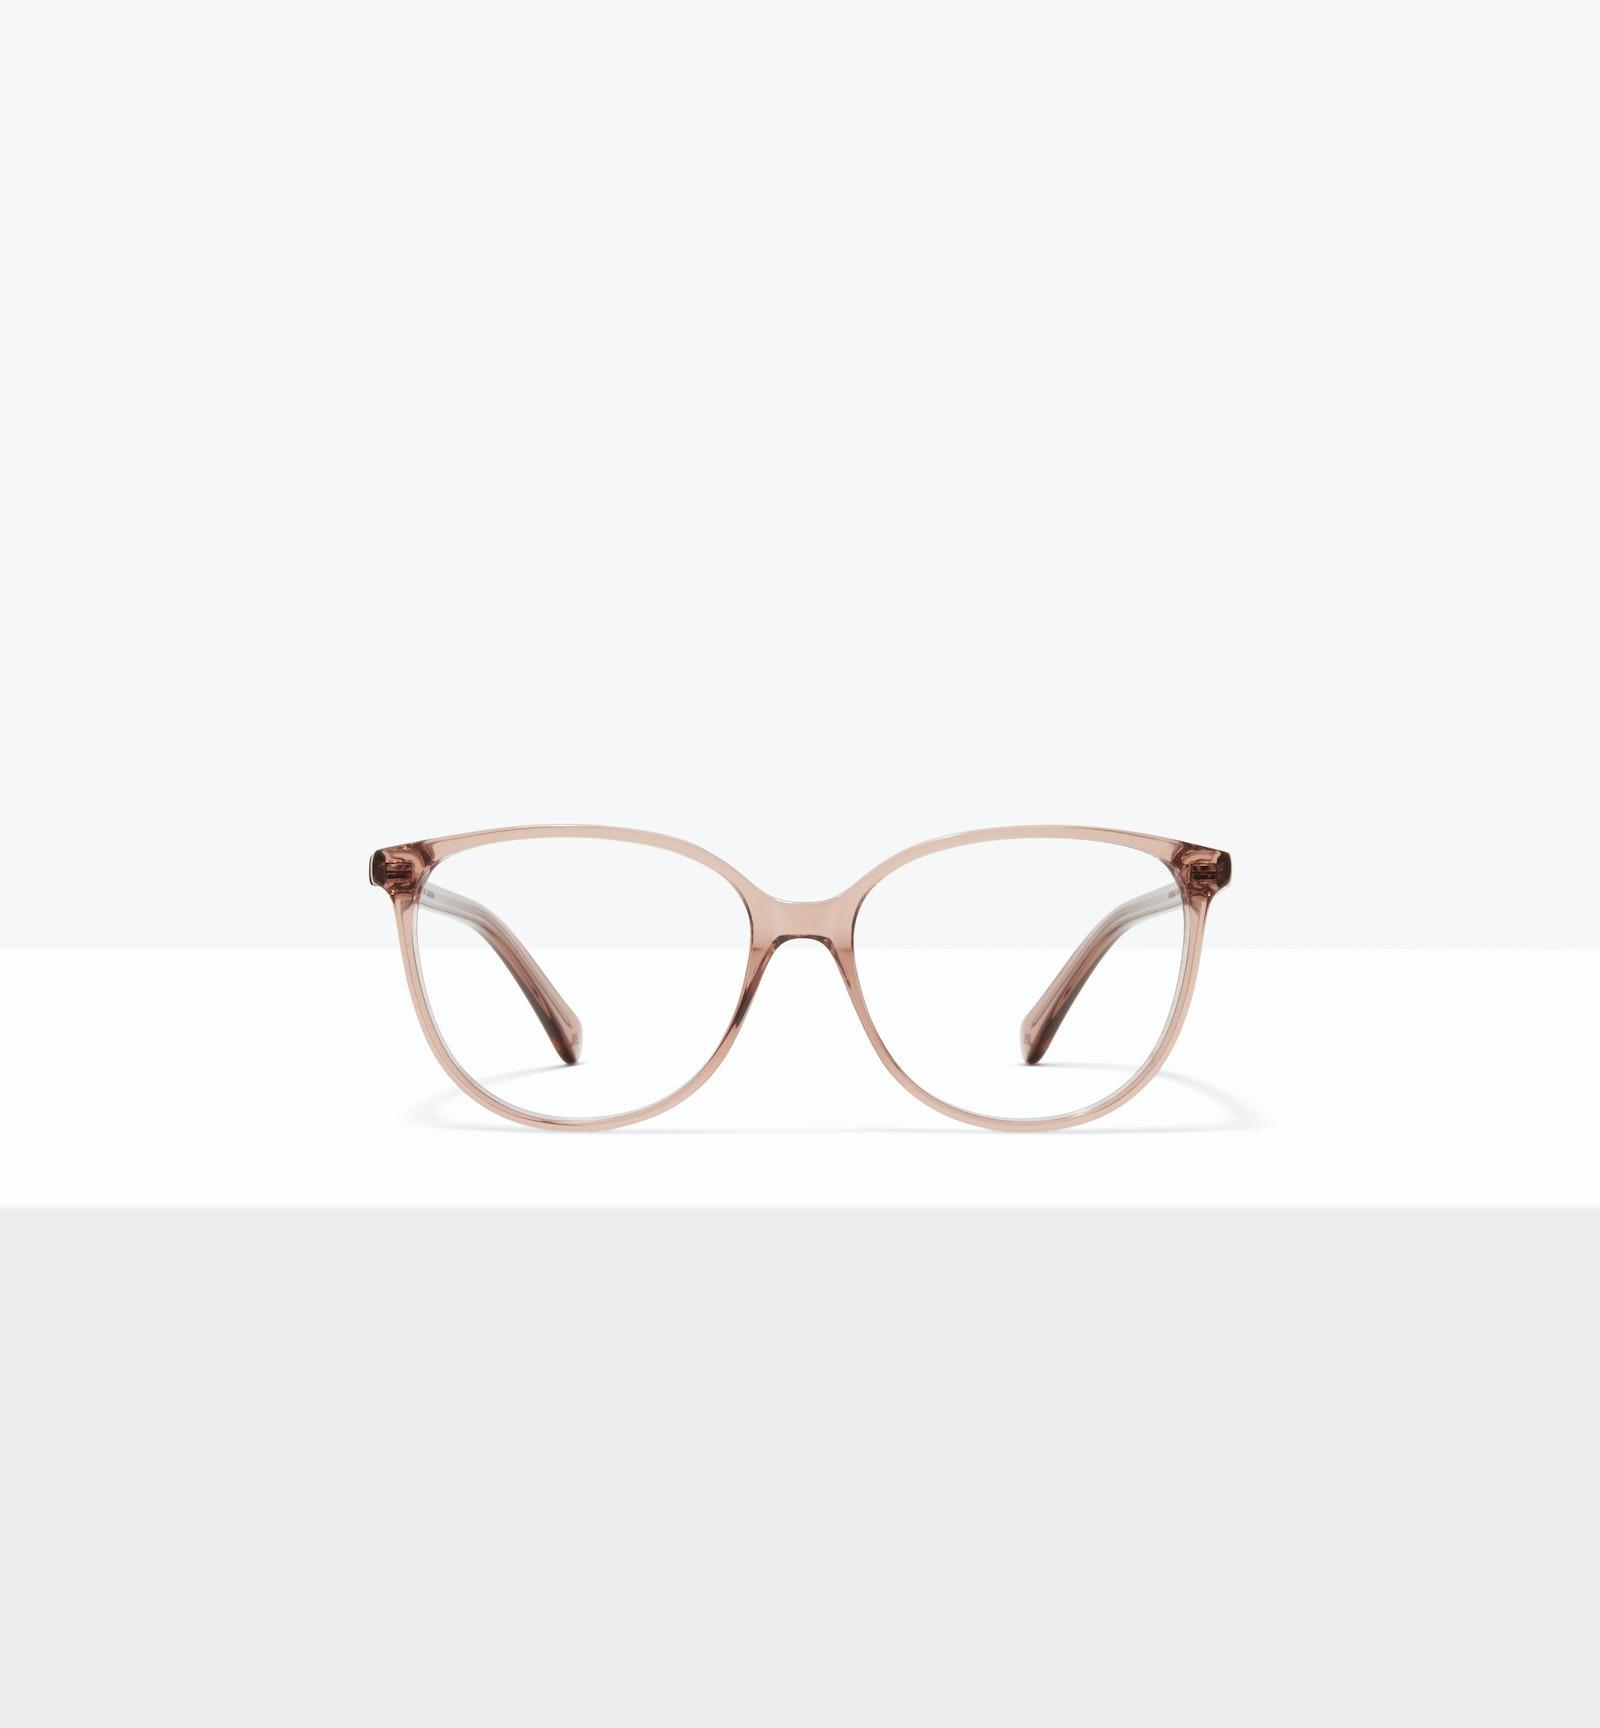 Affordable Fashion Glasses Cat Eye Eyeglasses Women Imagine XL Rose